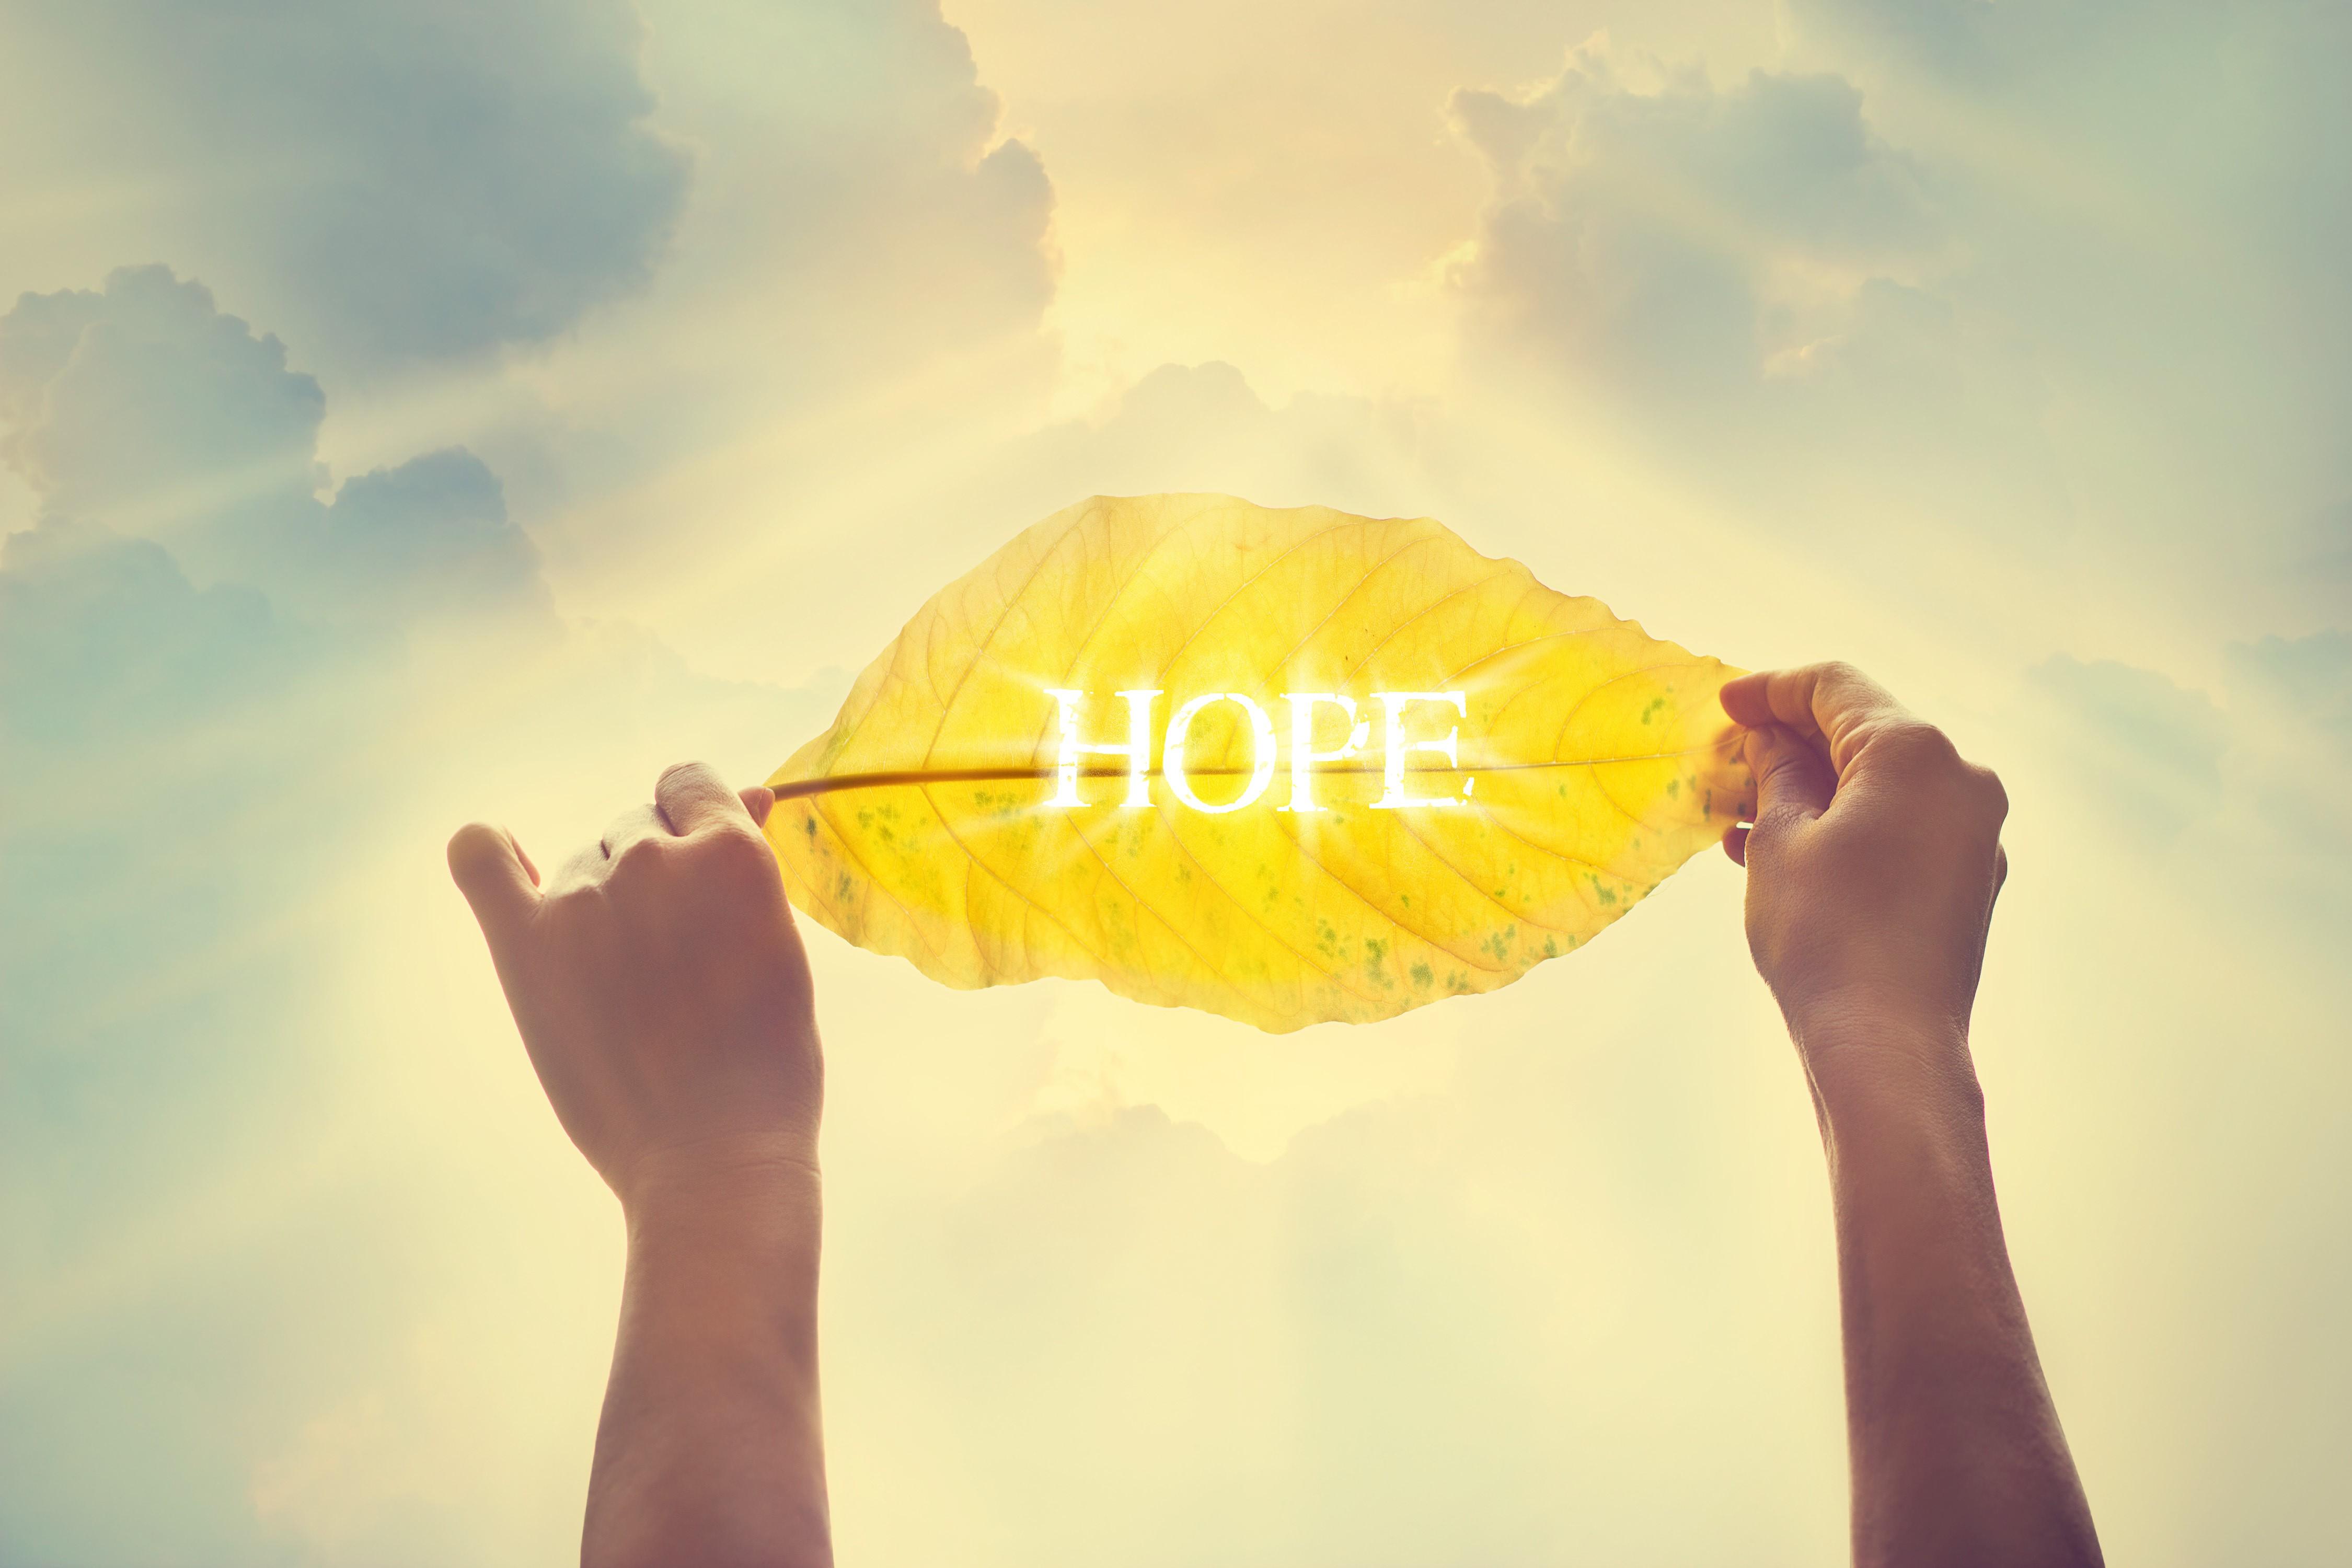 Hope and healing